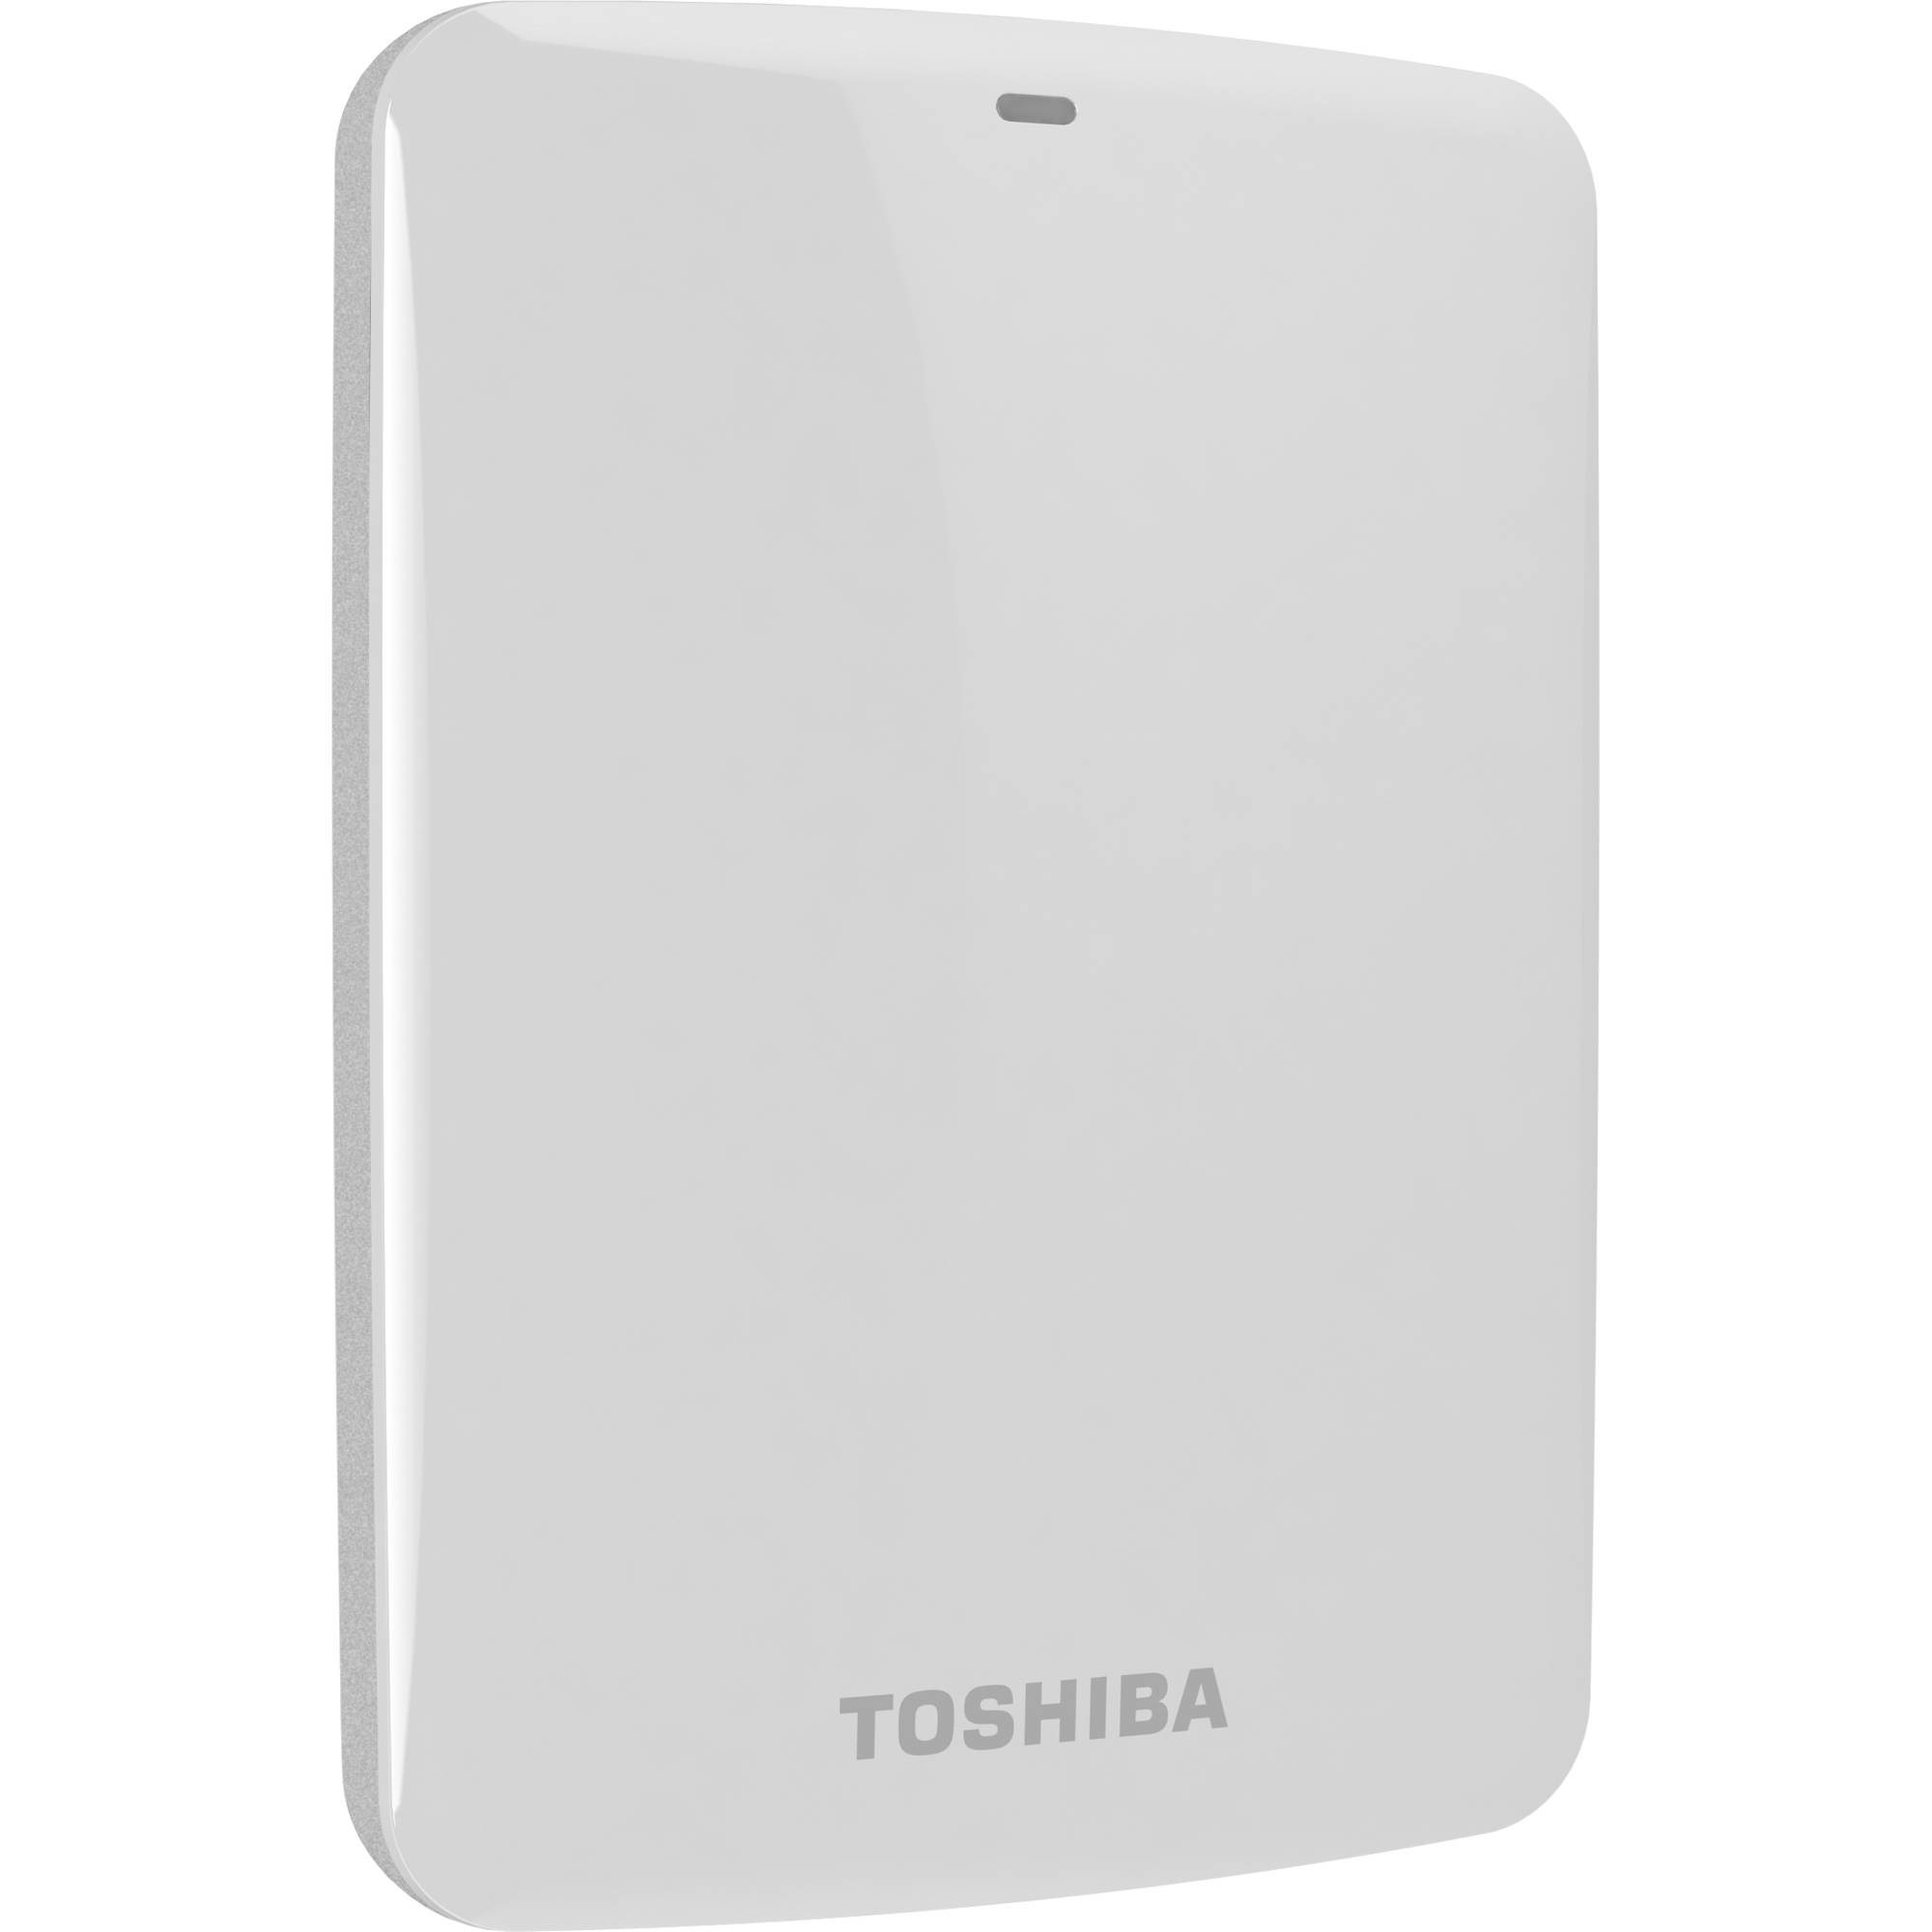 Toshiba Canvio Ready 1tb Usb30 Exte End 3 21 2017 815 Pm Thosiba Basic Hardisk Exsternal Specifications Of External Hard Disk White